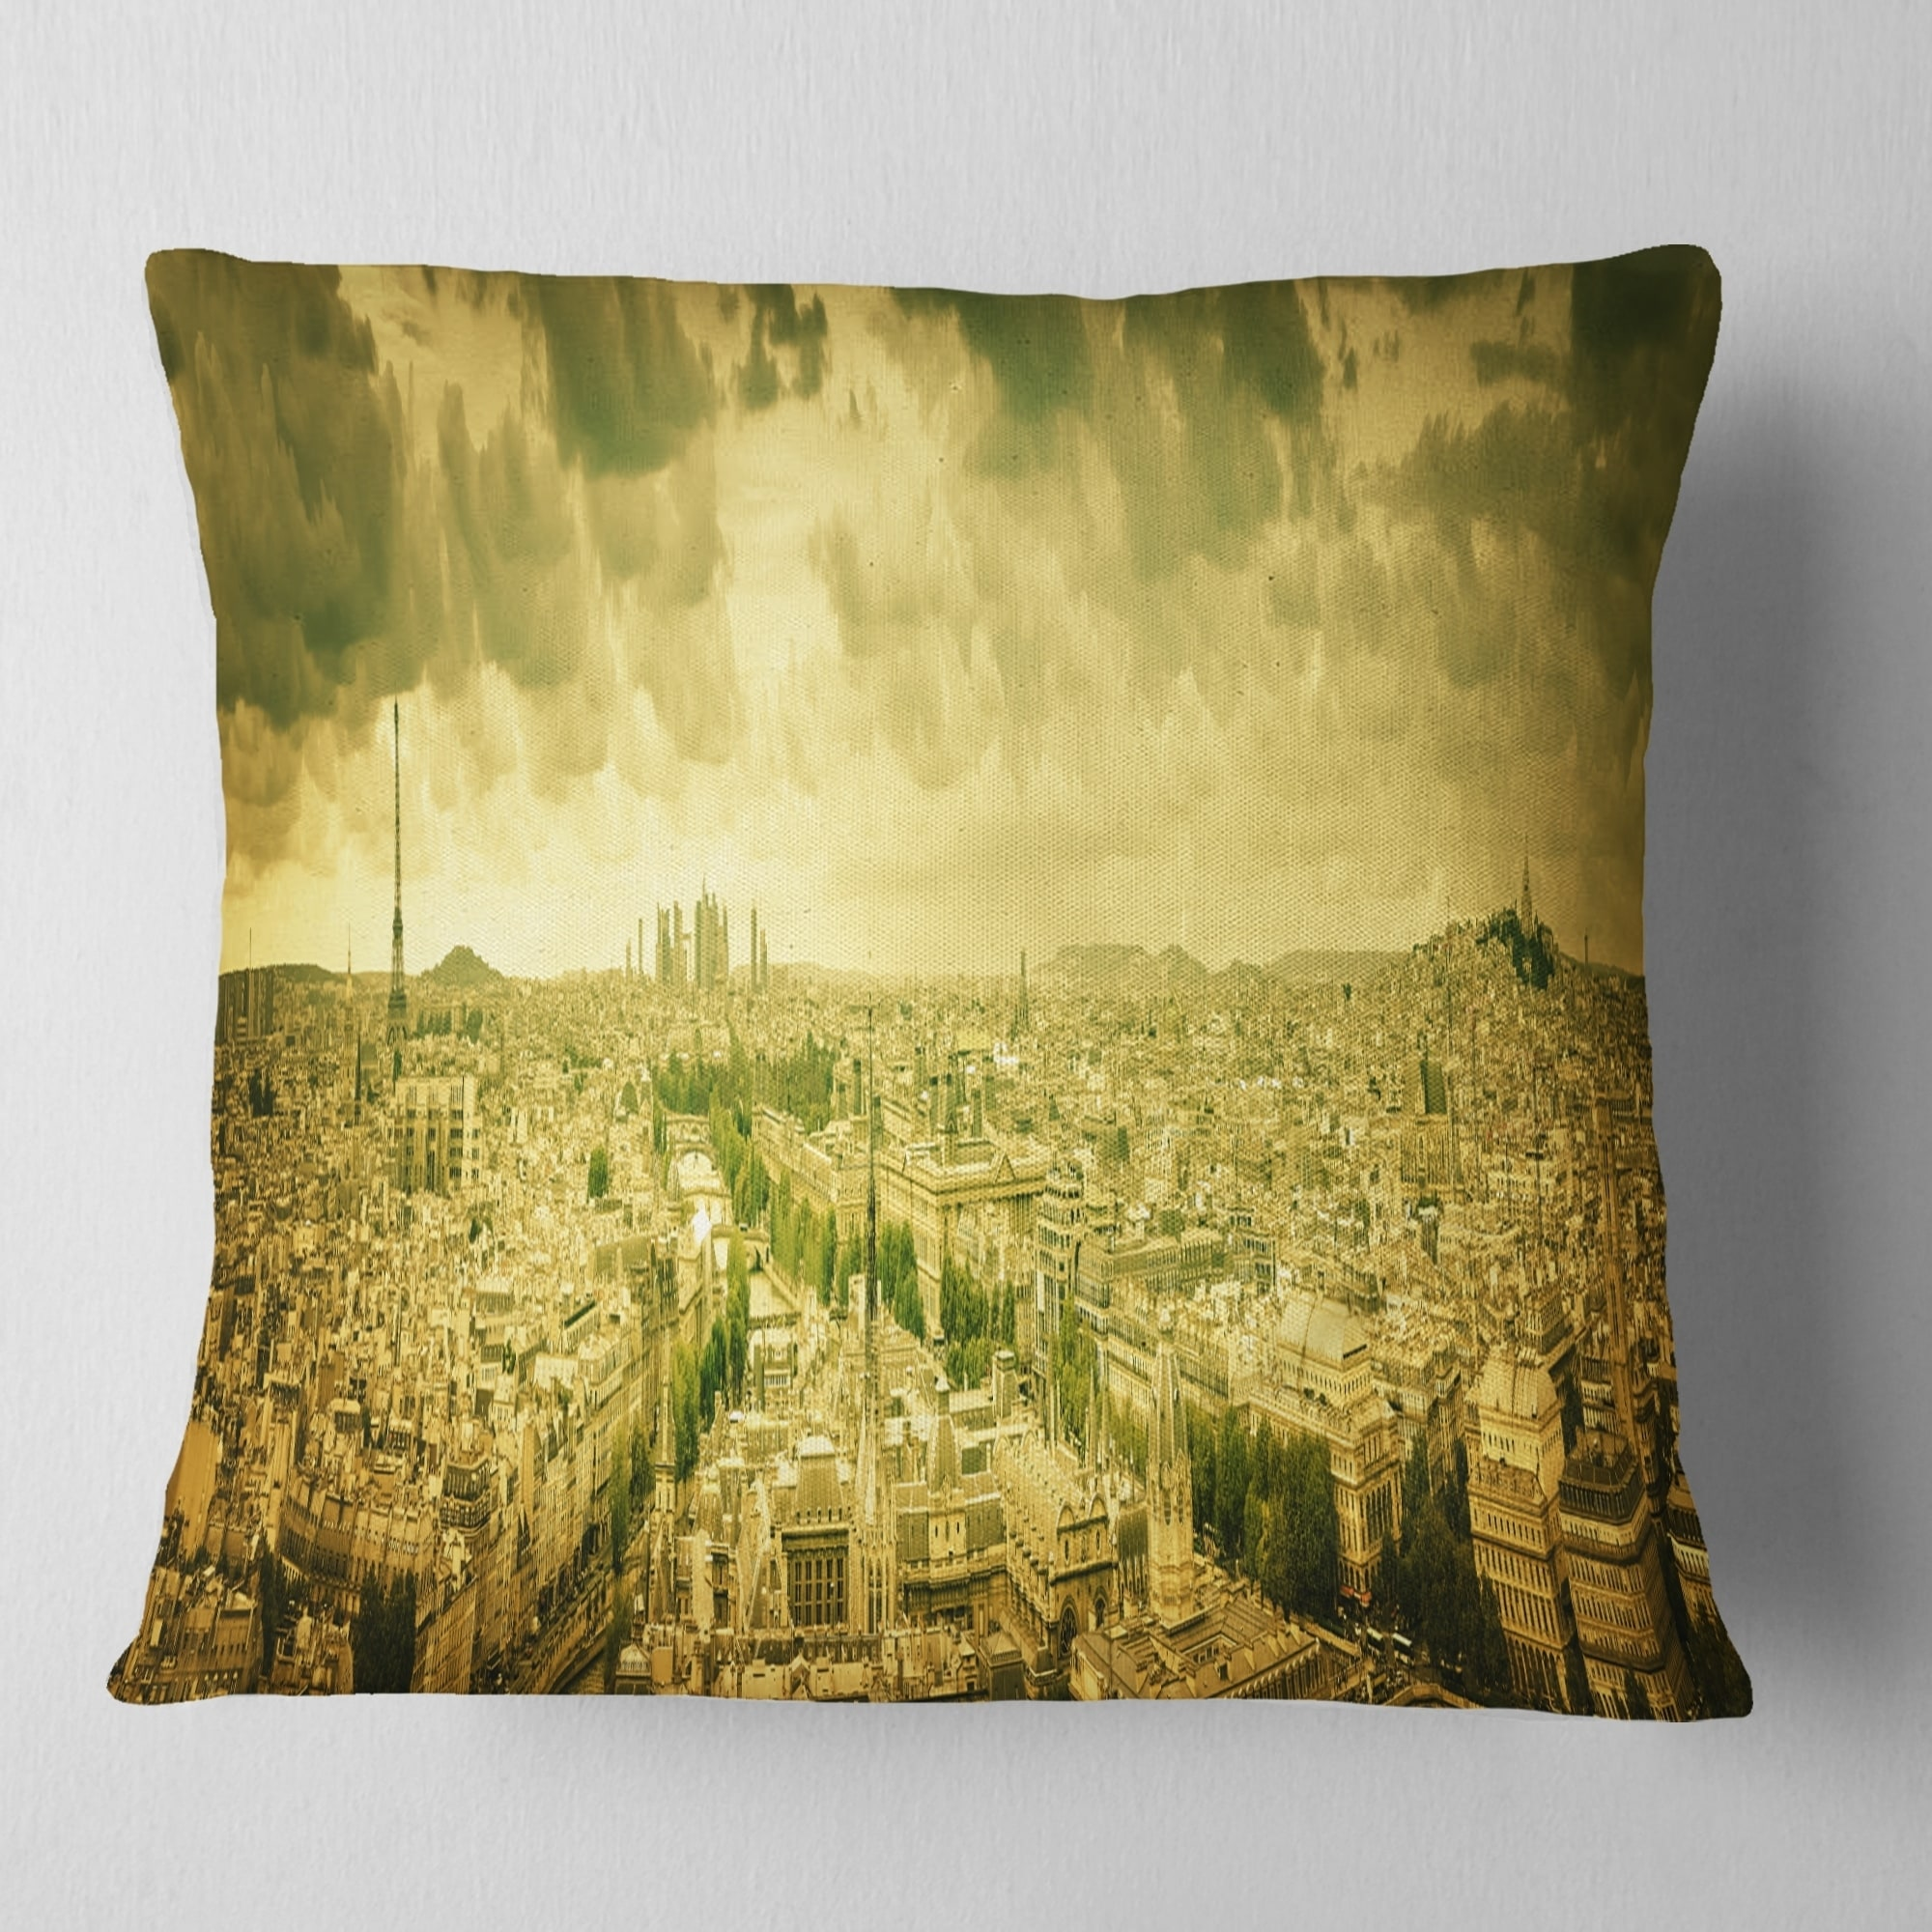 Design Art Designart Paris Panorama With Scenic Sky Skyline Photography Throw Pillow Walmart Com